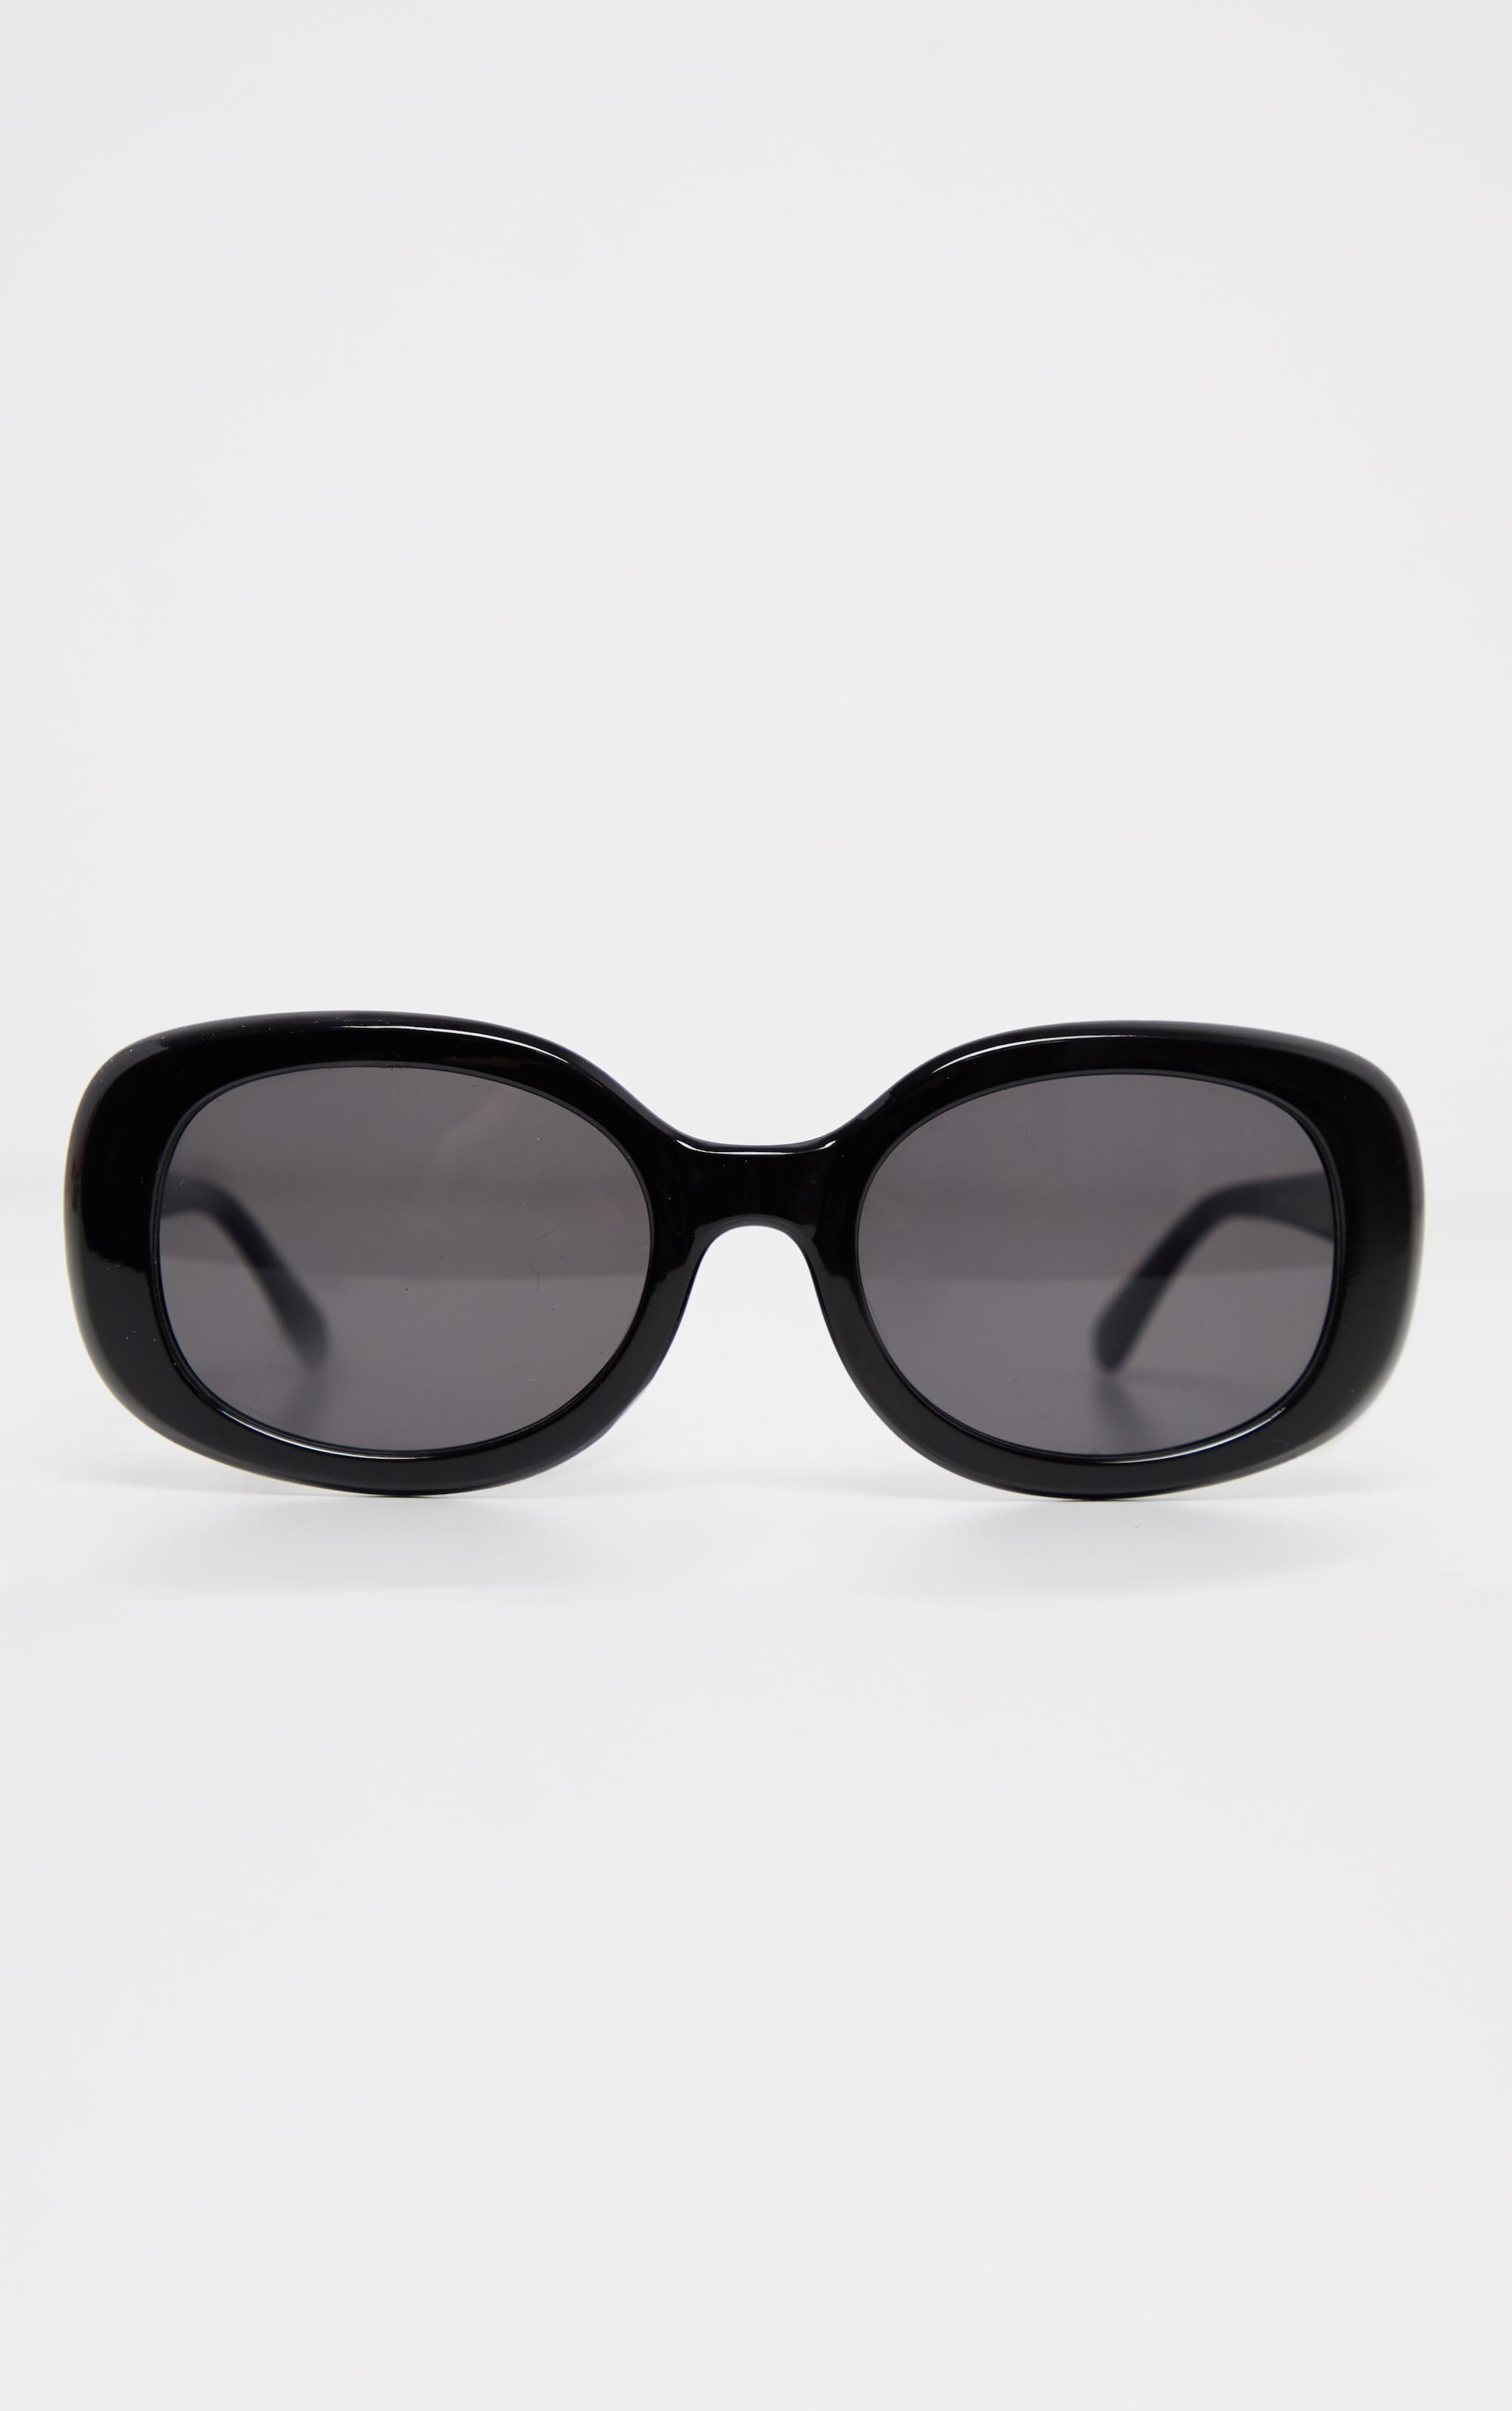 Black Oval Shape Retro Sunglasses